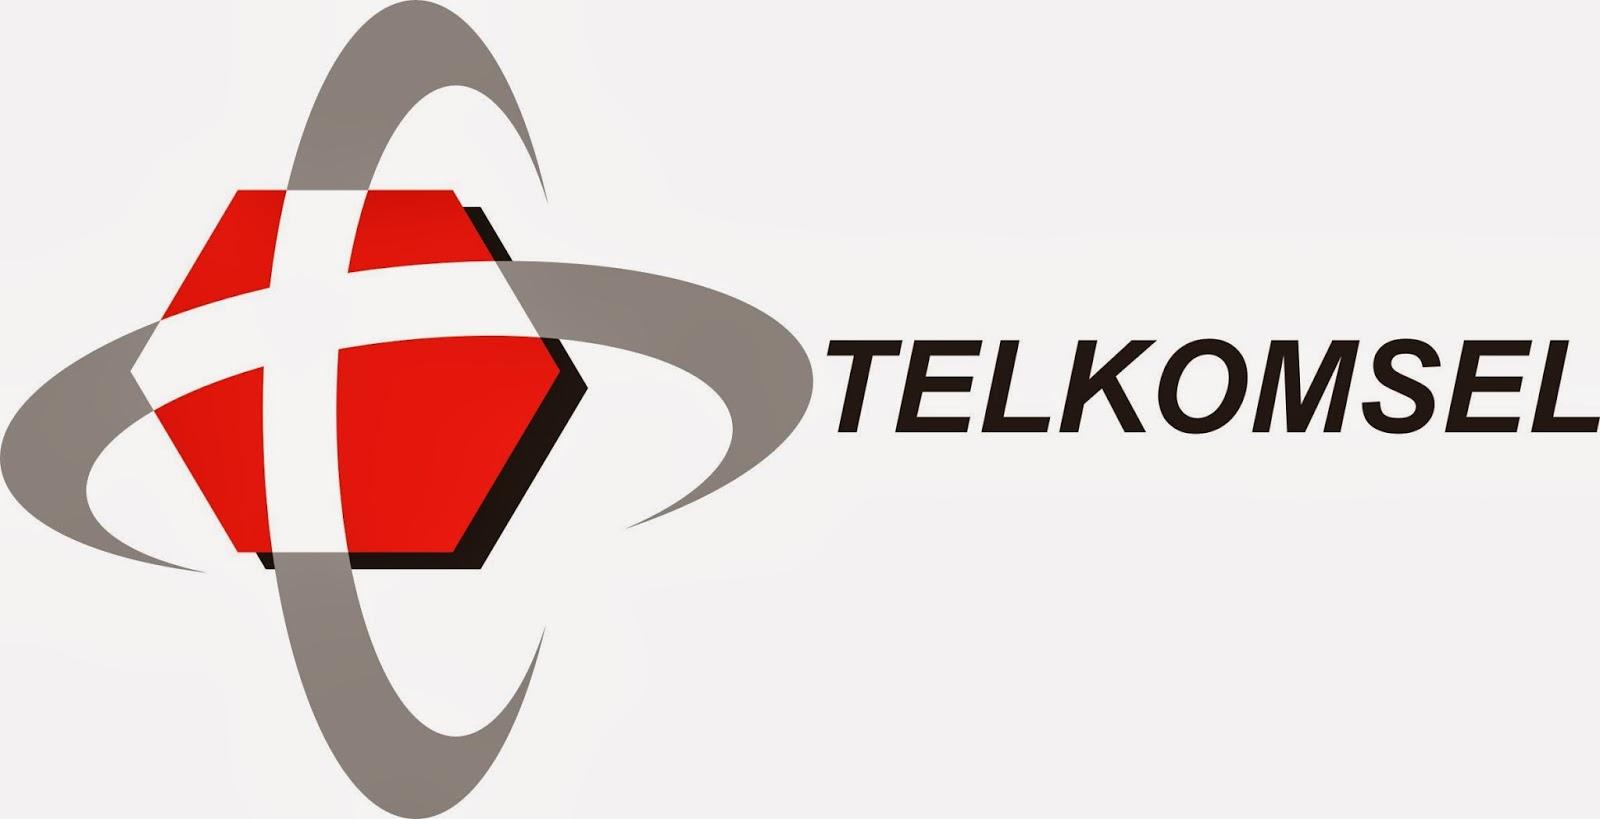 Sixth image of Arti Logo Telkom with DarkCombhie: Arti Lambang Telkomsel